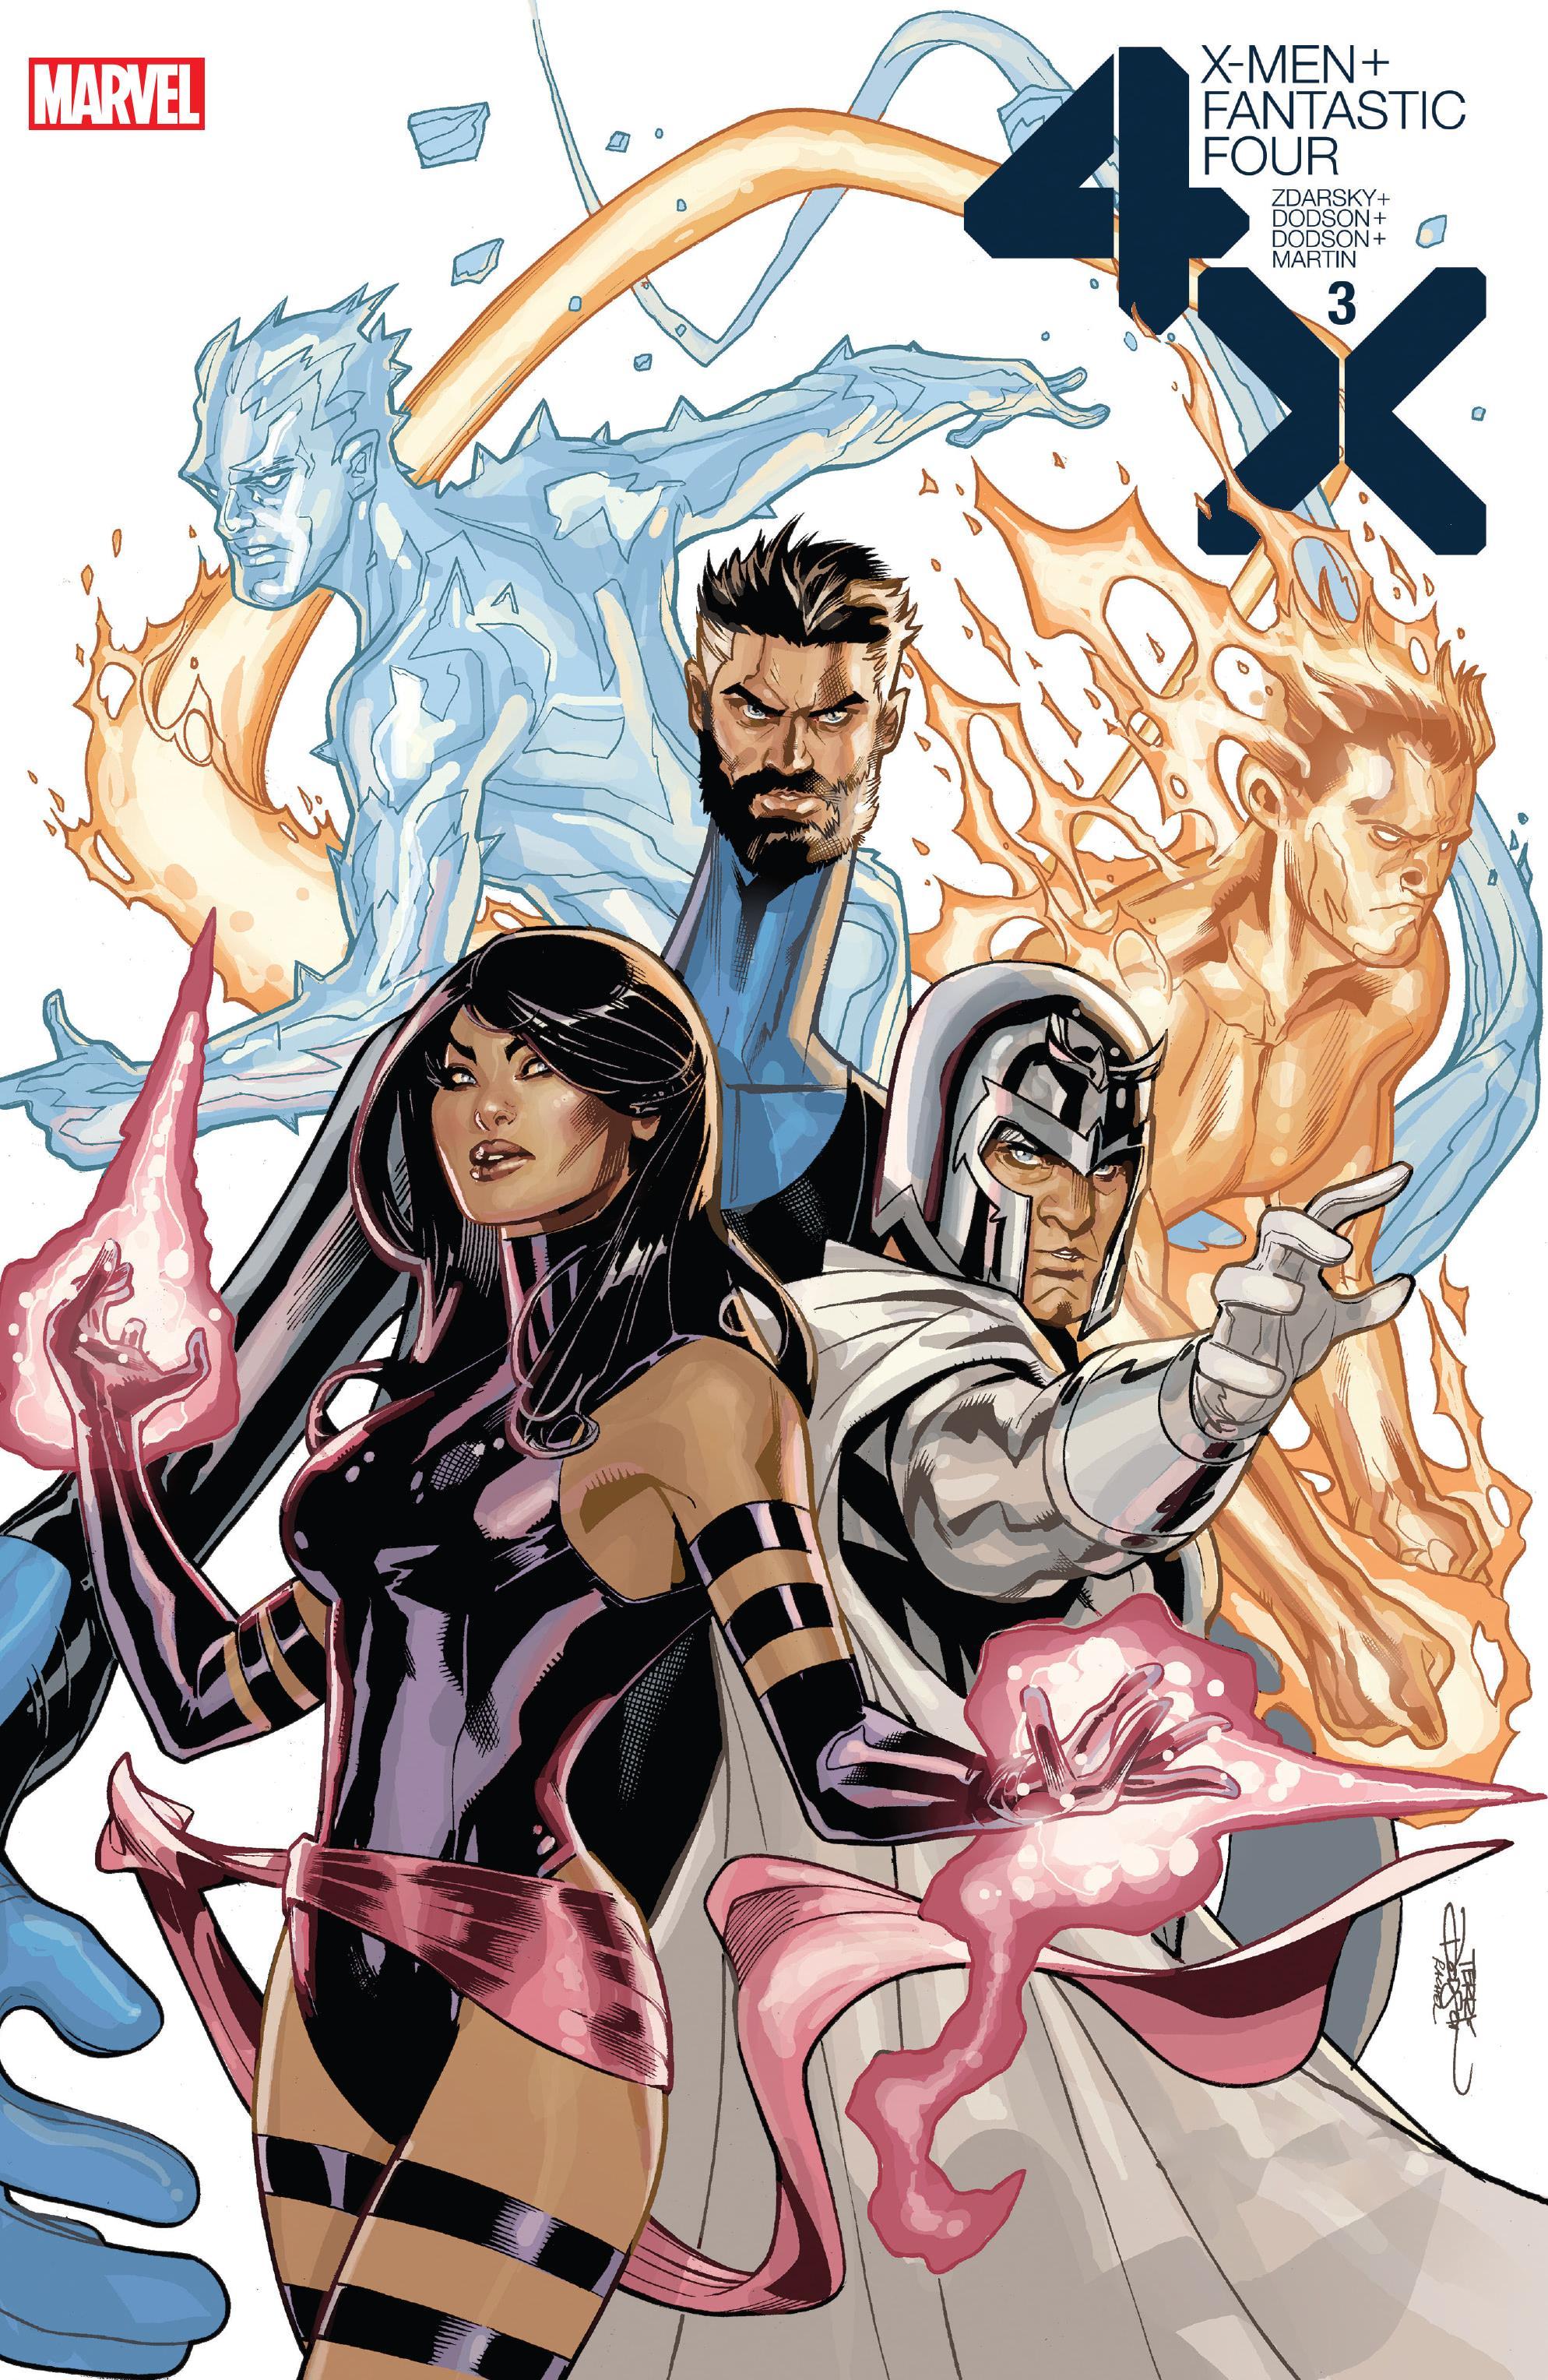 X-Men-Fantastic Four 003 2020 Digital Zone